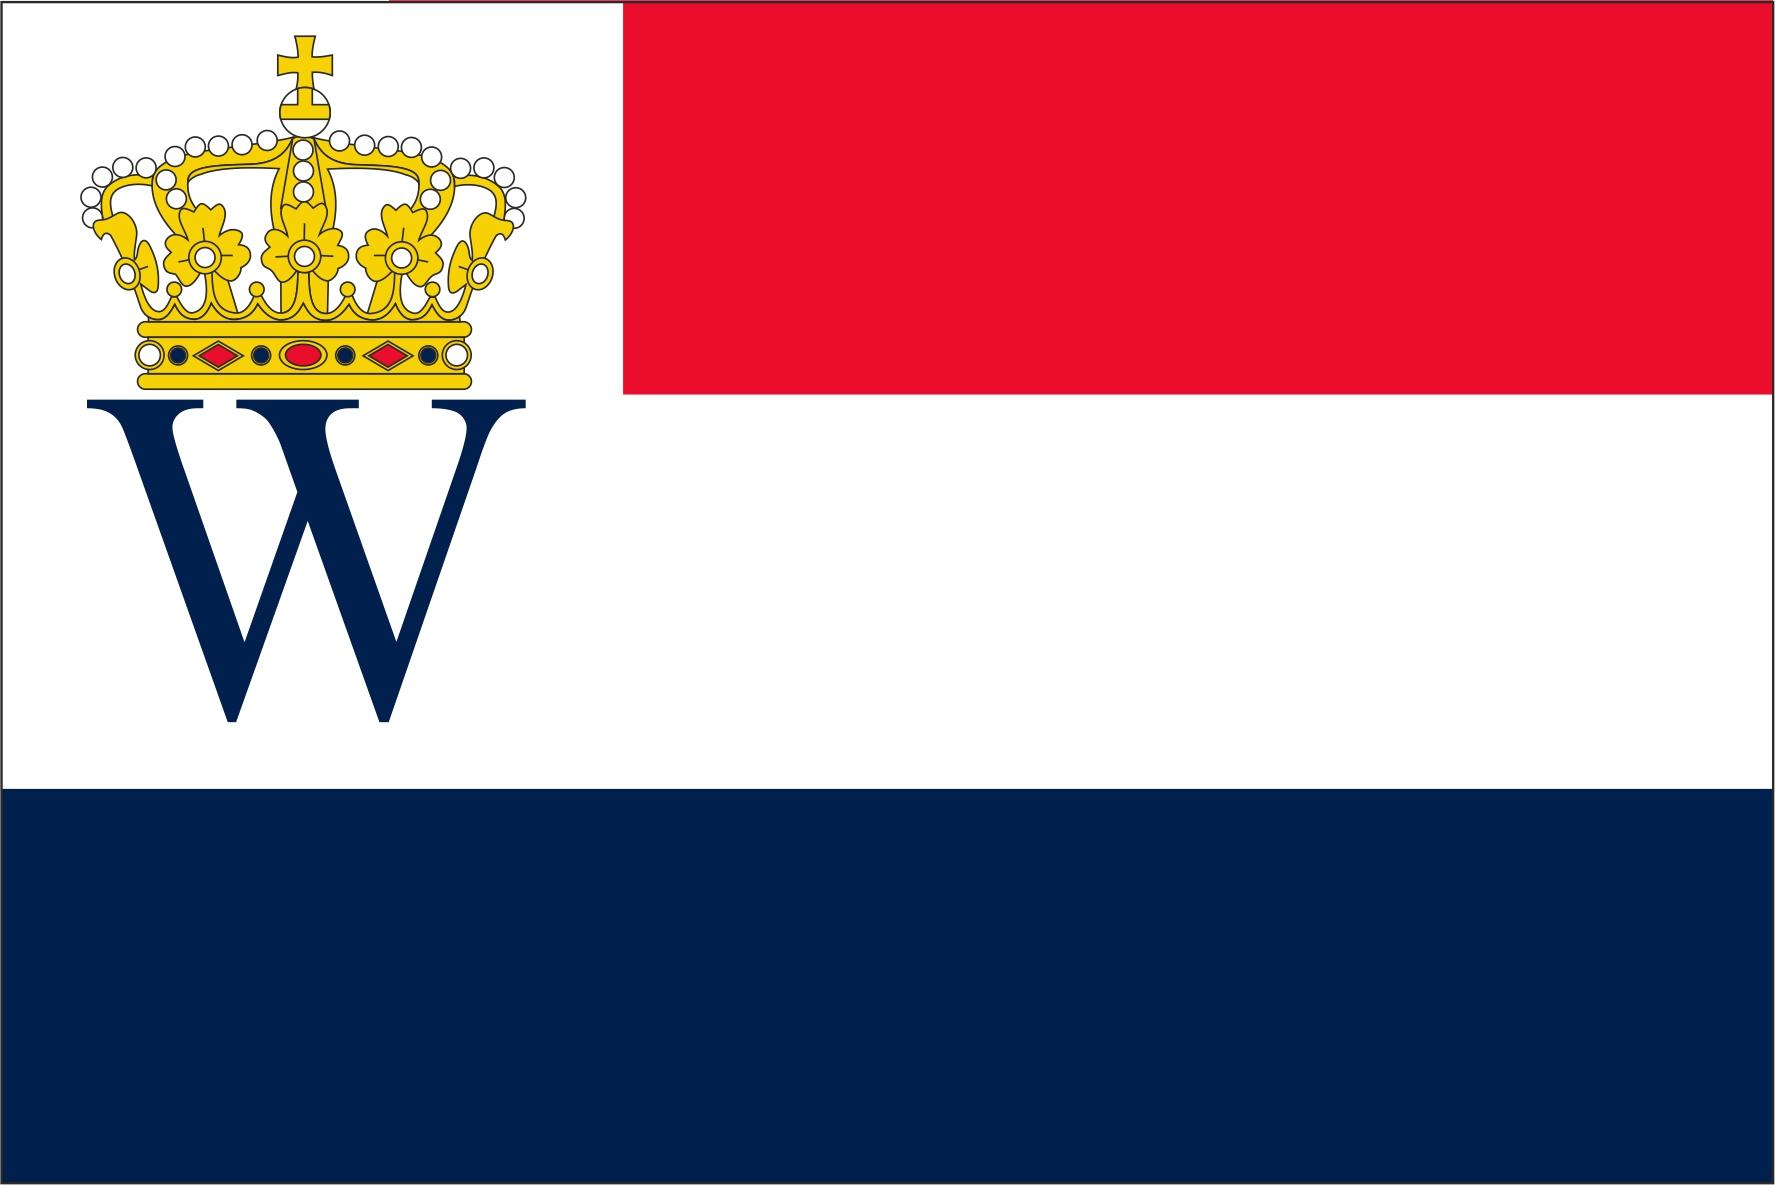 Koninklijke Watersport Vlag 100x150cm Oud Hollands